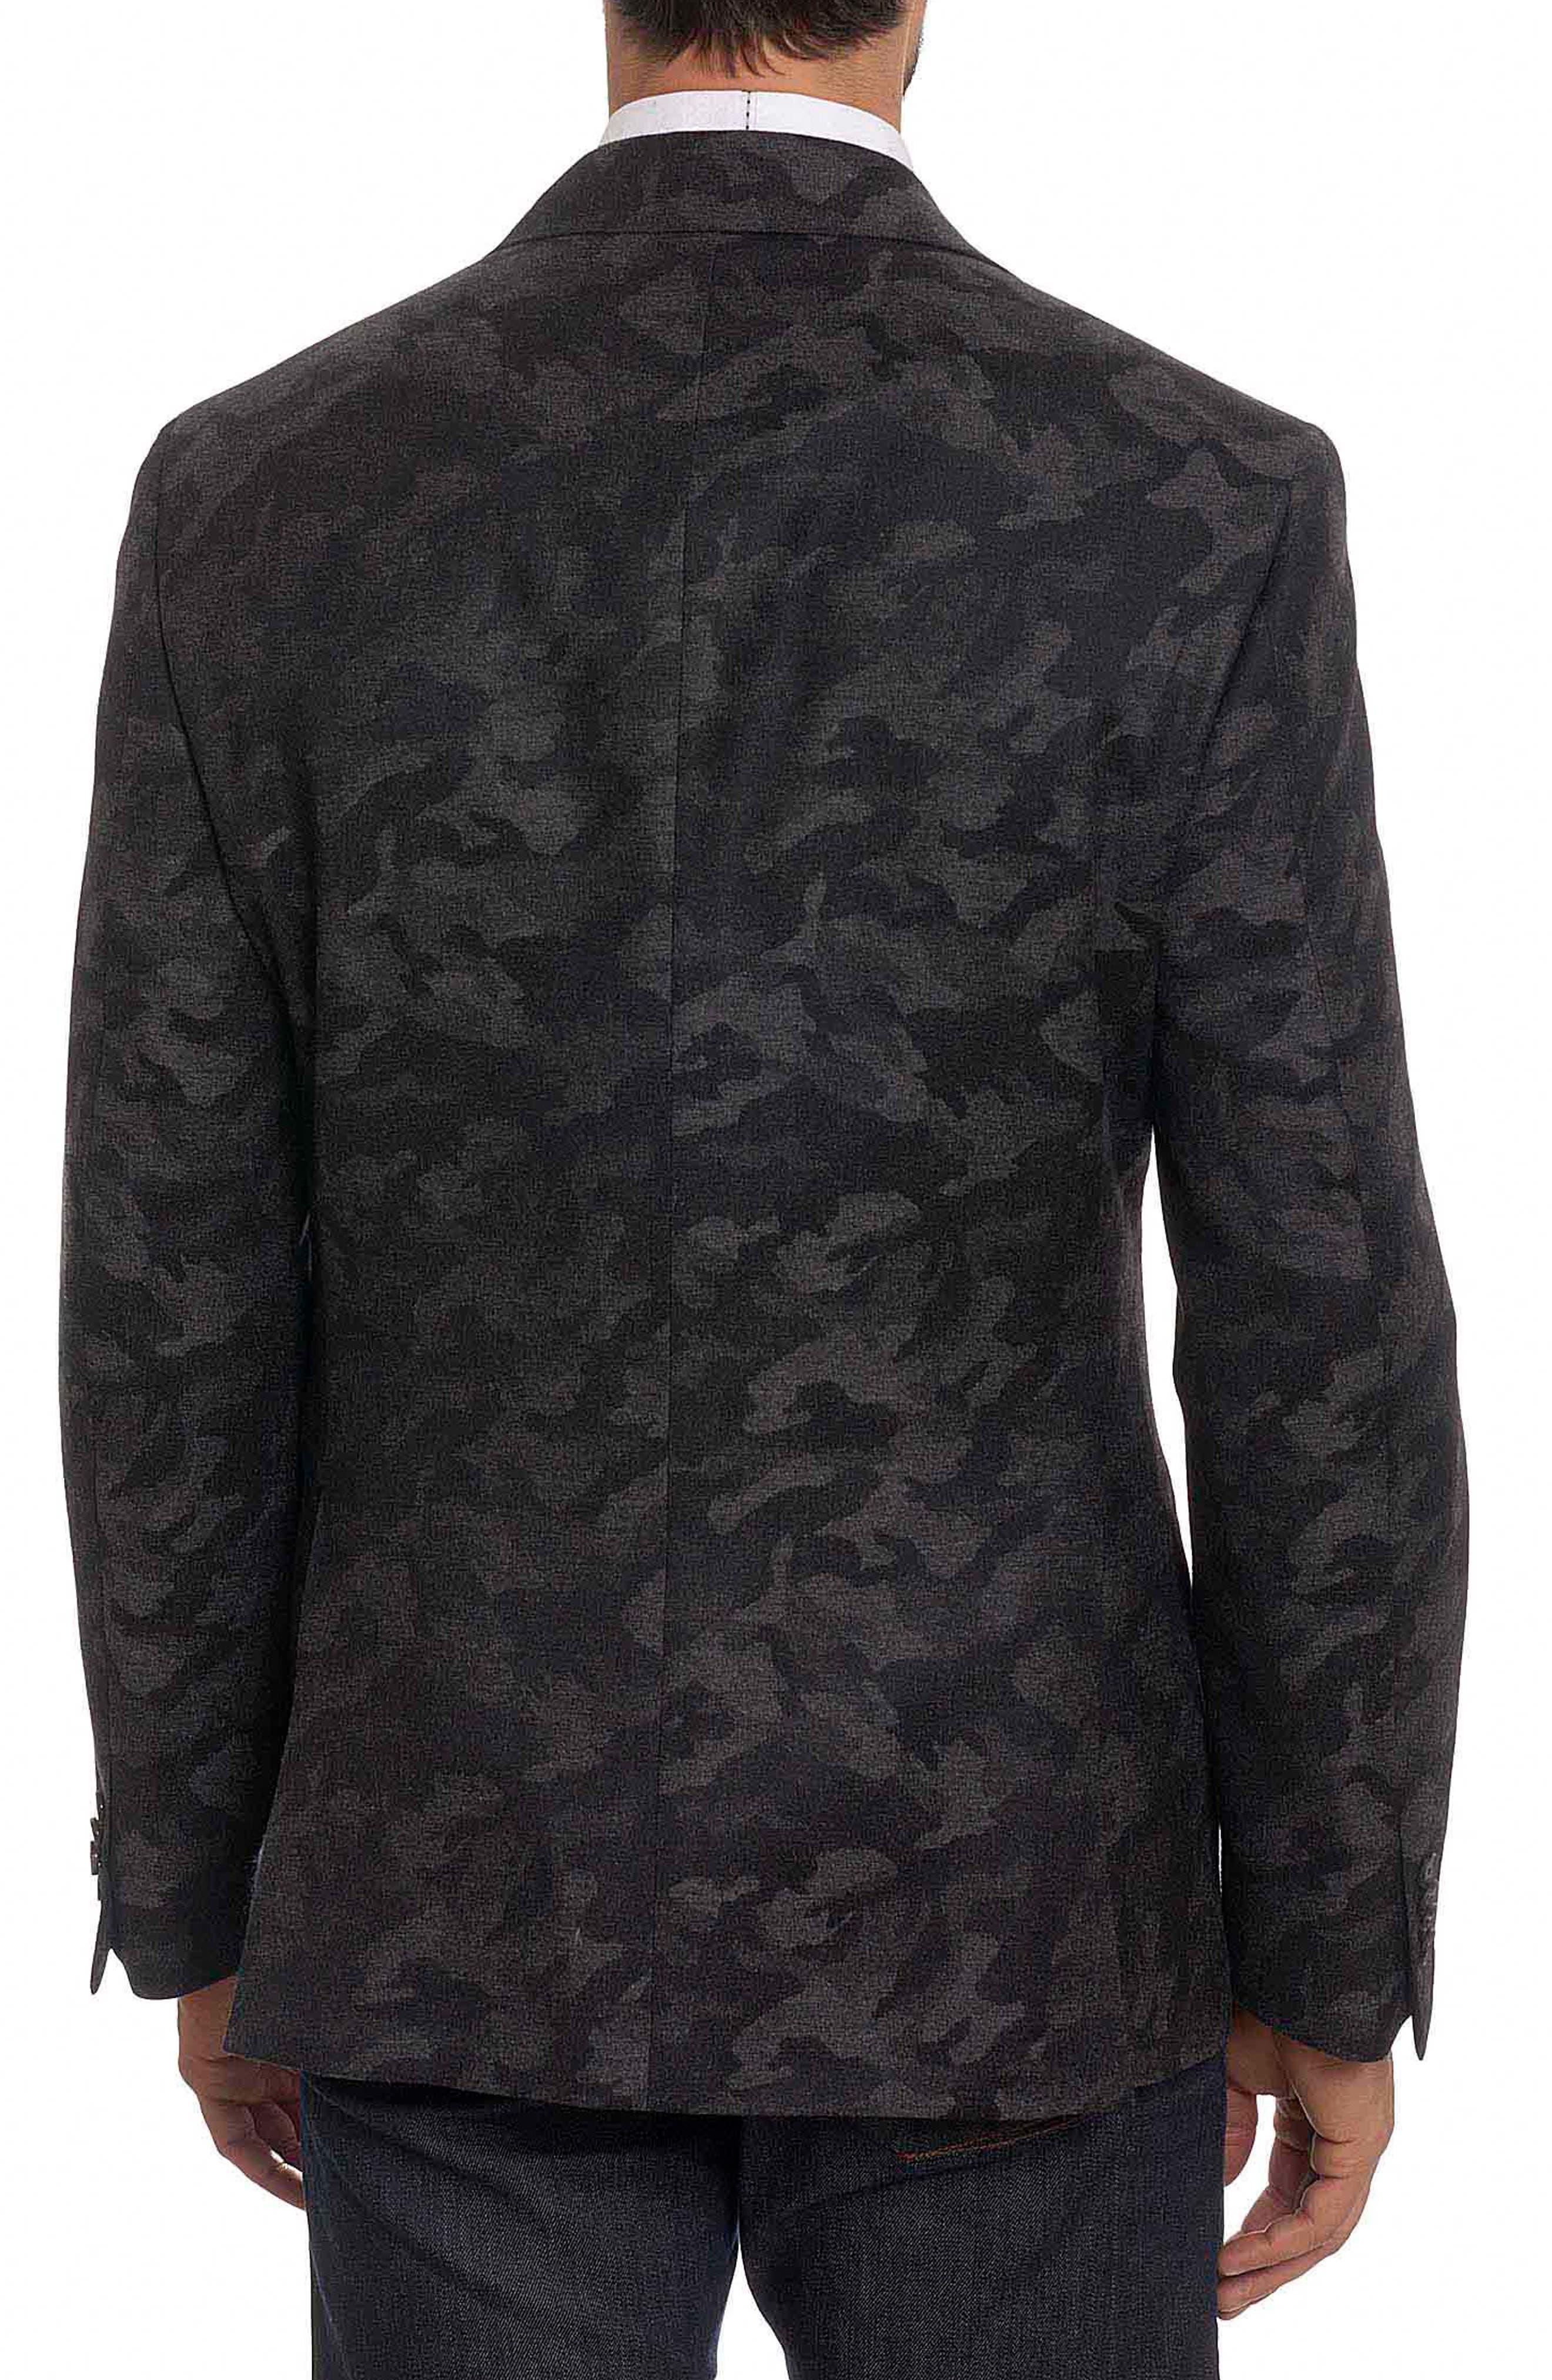 Portgain Classic Fit Sport Coat,                             Alternate thumbnail 2, color,                             Grey